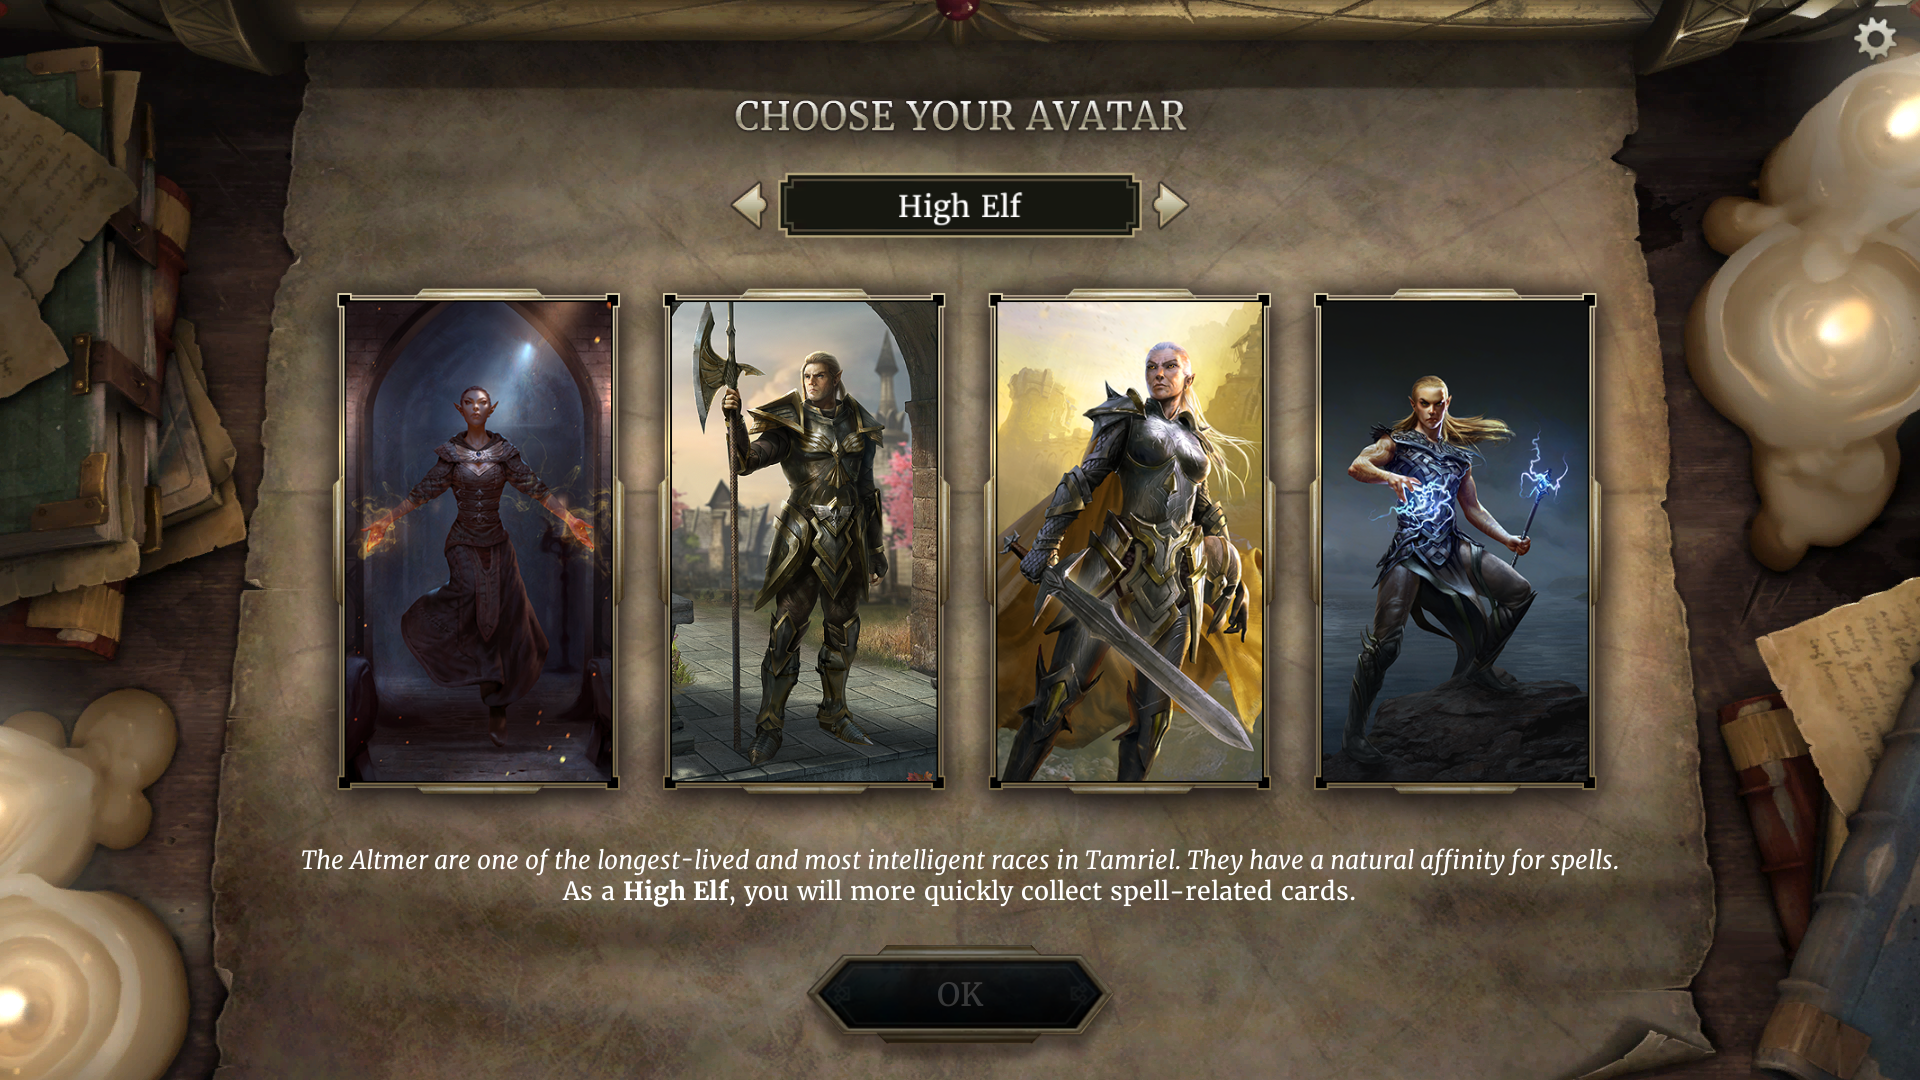 Altmer Legends Elder Scrolls Fandom Powered By Wikia